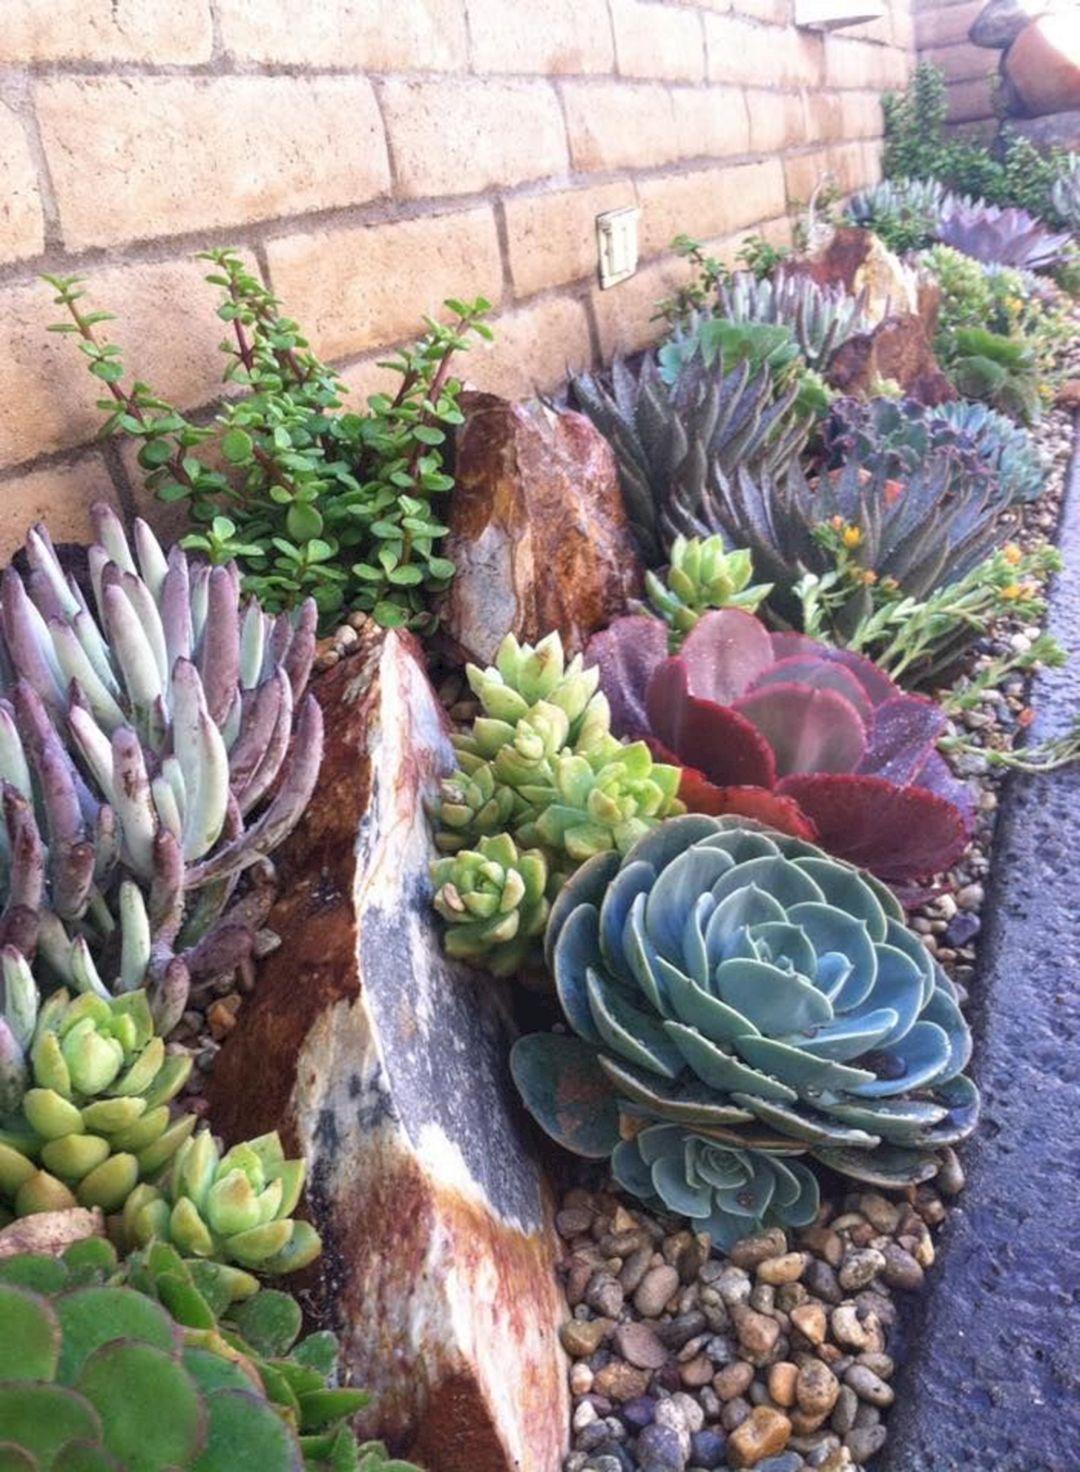 Sublime 30 Beautiful Desert Garden Design Ideas For Your Backyard  Https://freshouz.com/30 Beautiful Desert Garden Design Ideas Backyard/  #home #decor ...